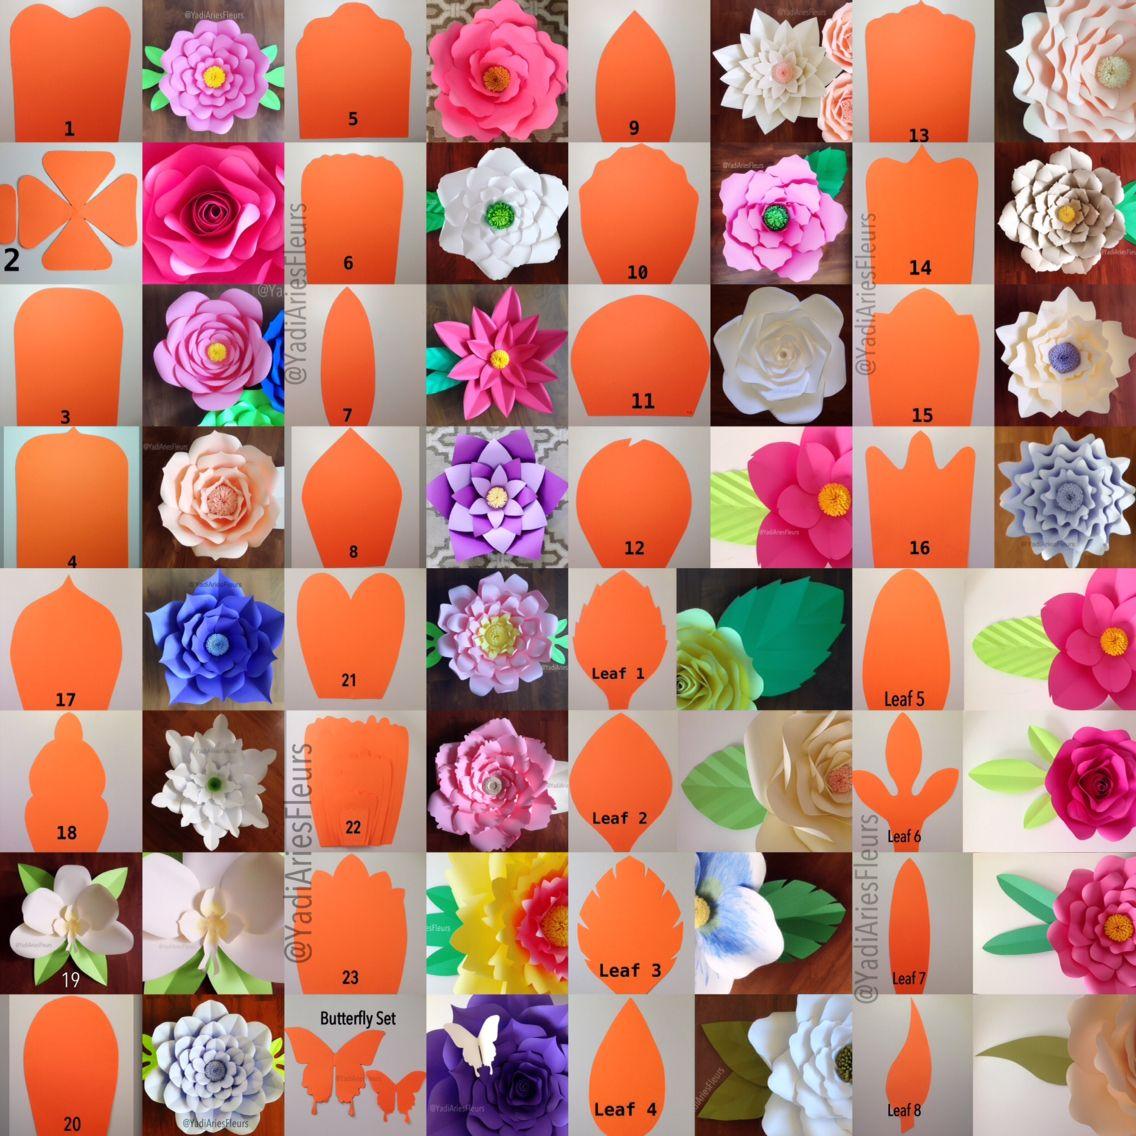 Diy Wall Flowers: Paper Flowers, Large Paper